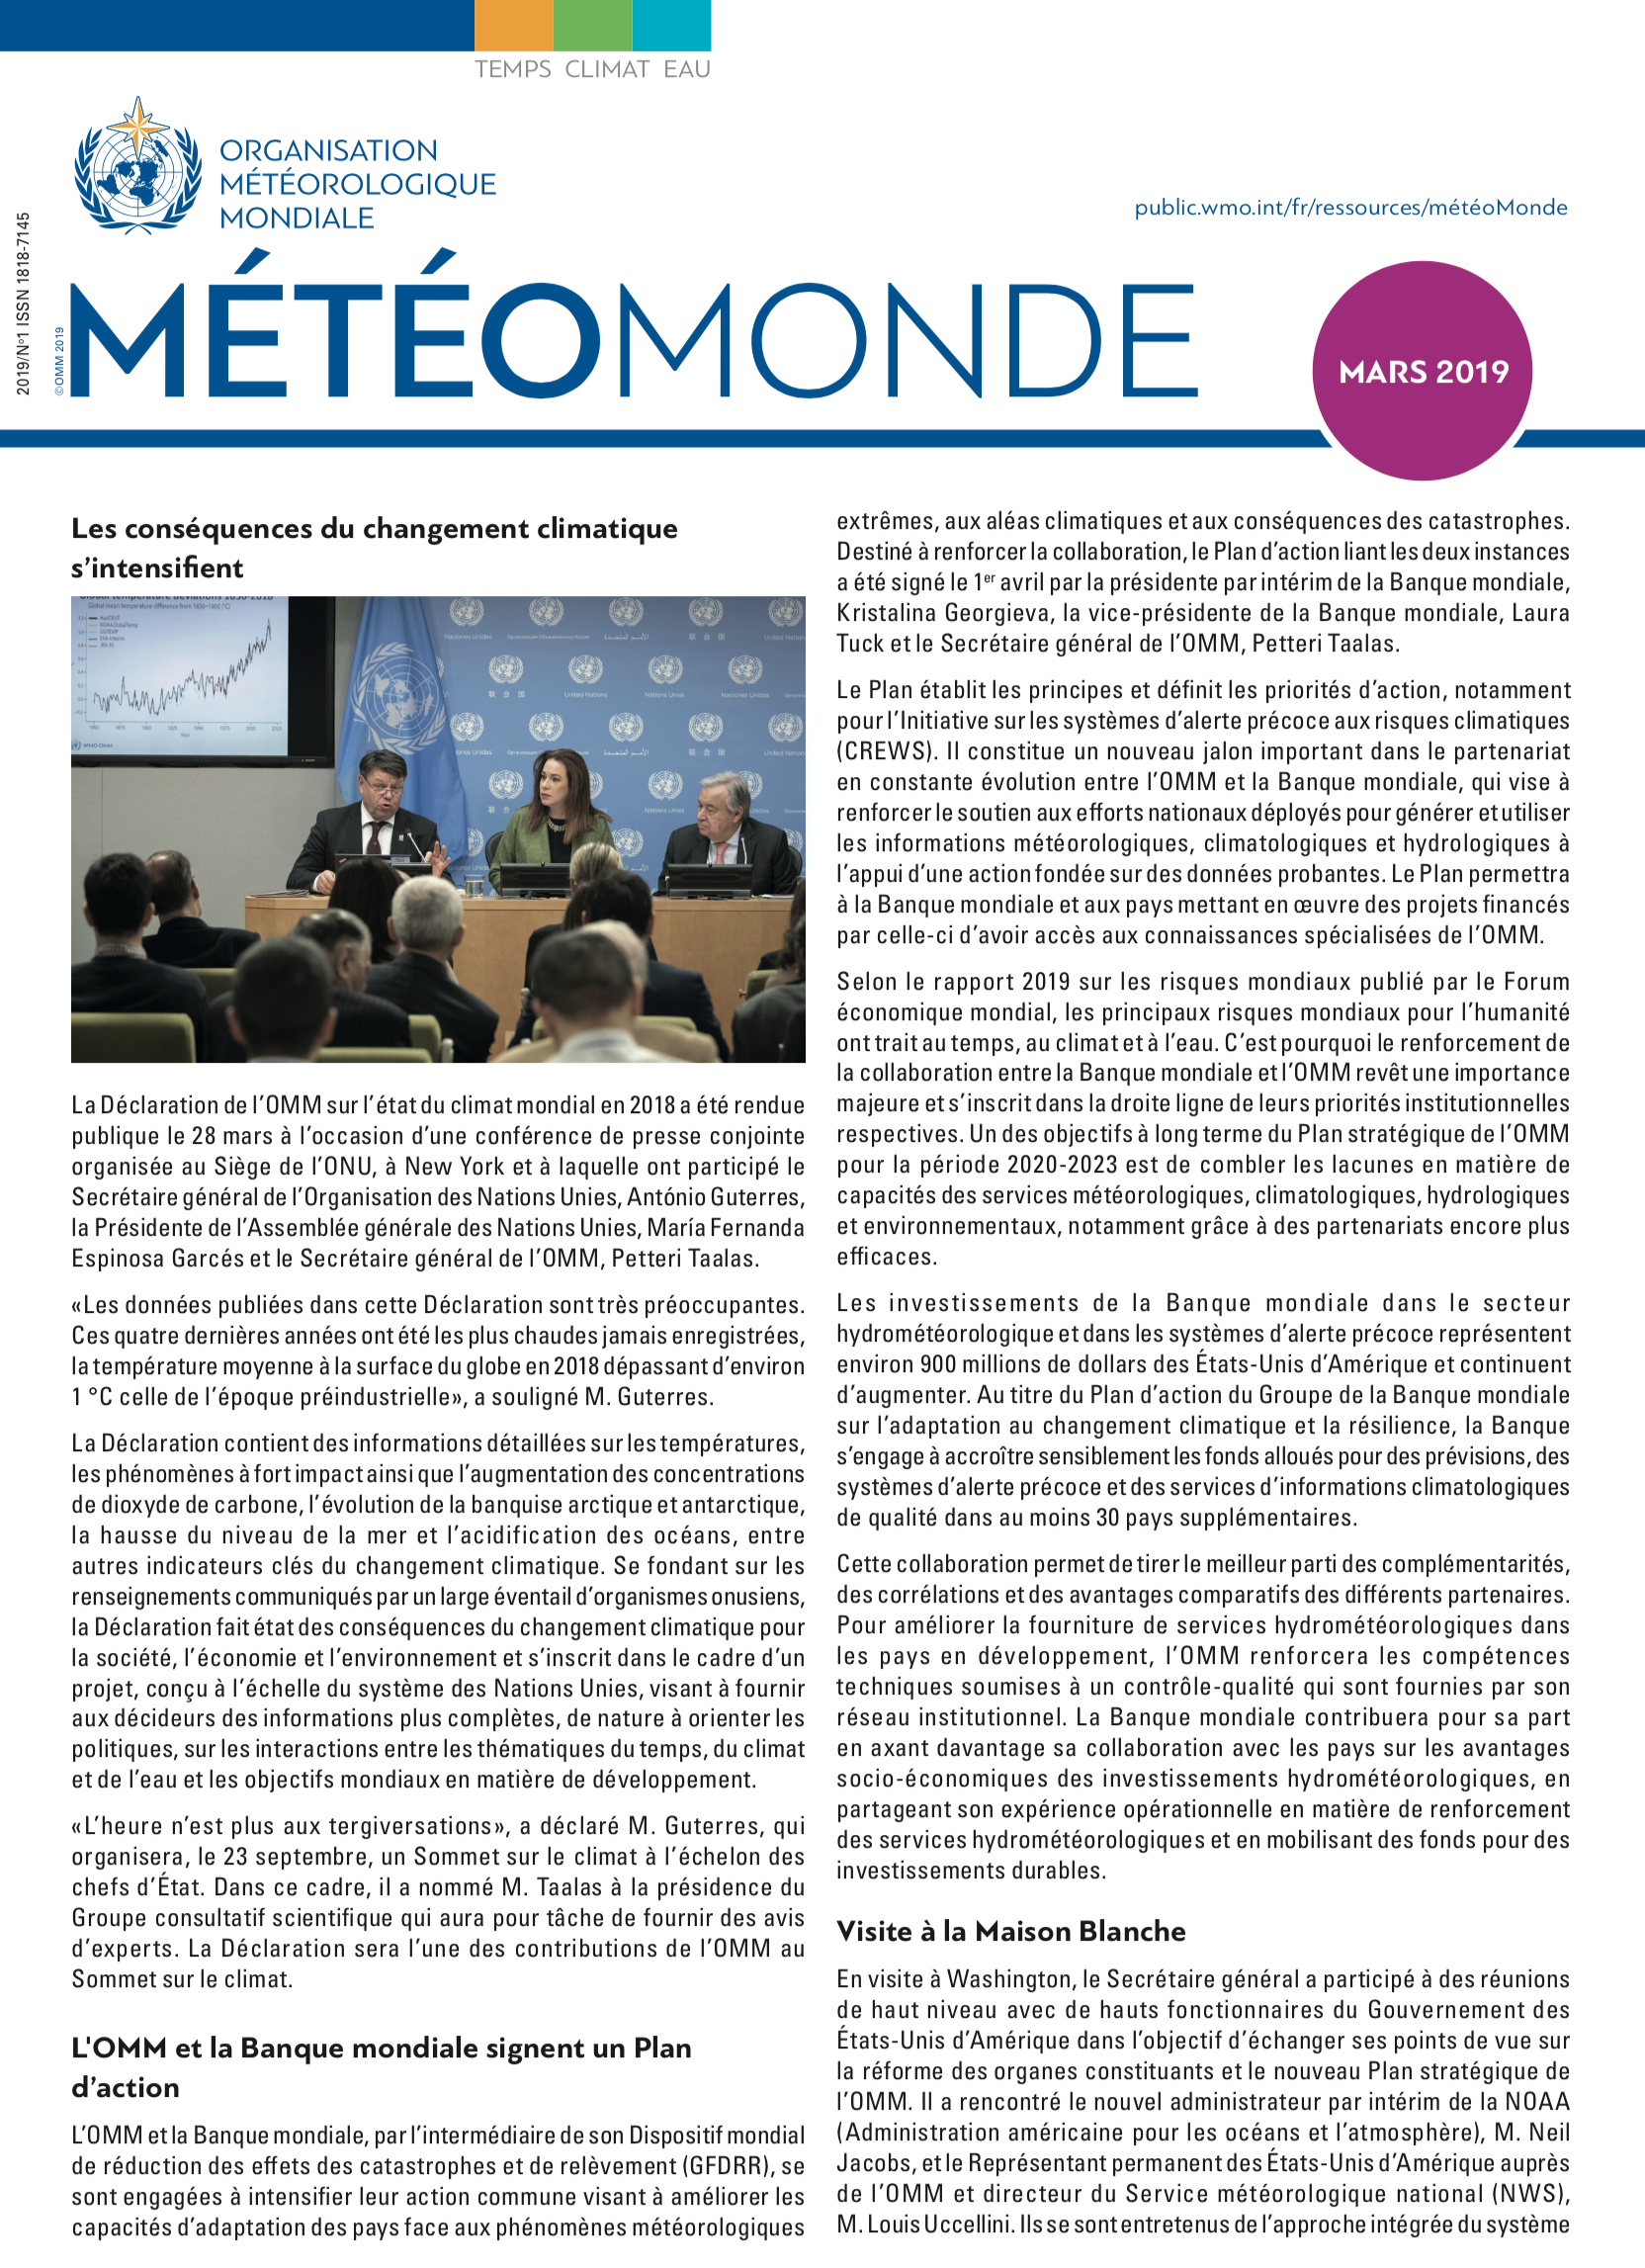 MétéoMonde No. 1 Mars 2019